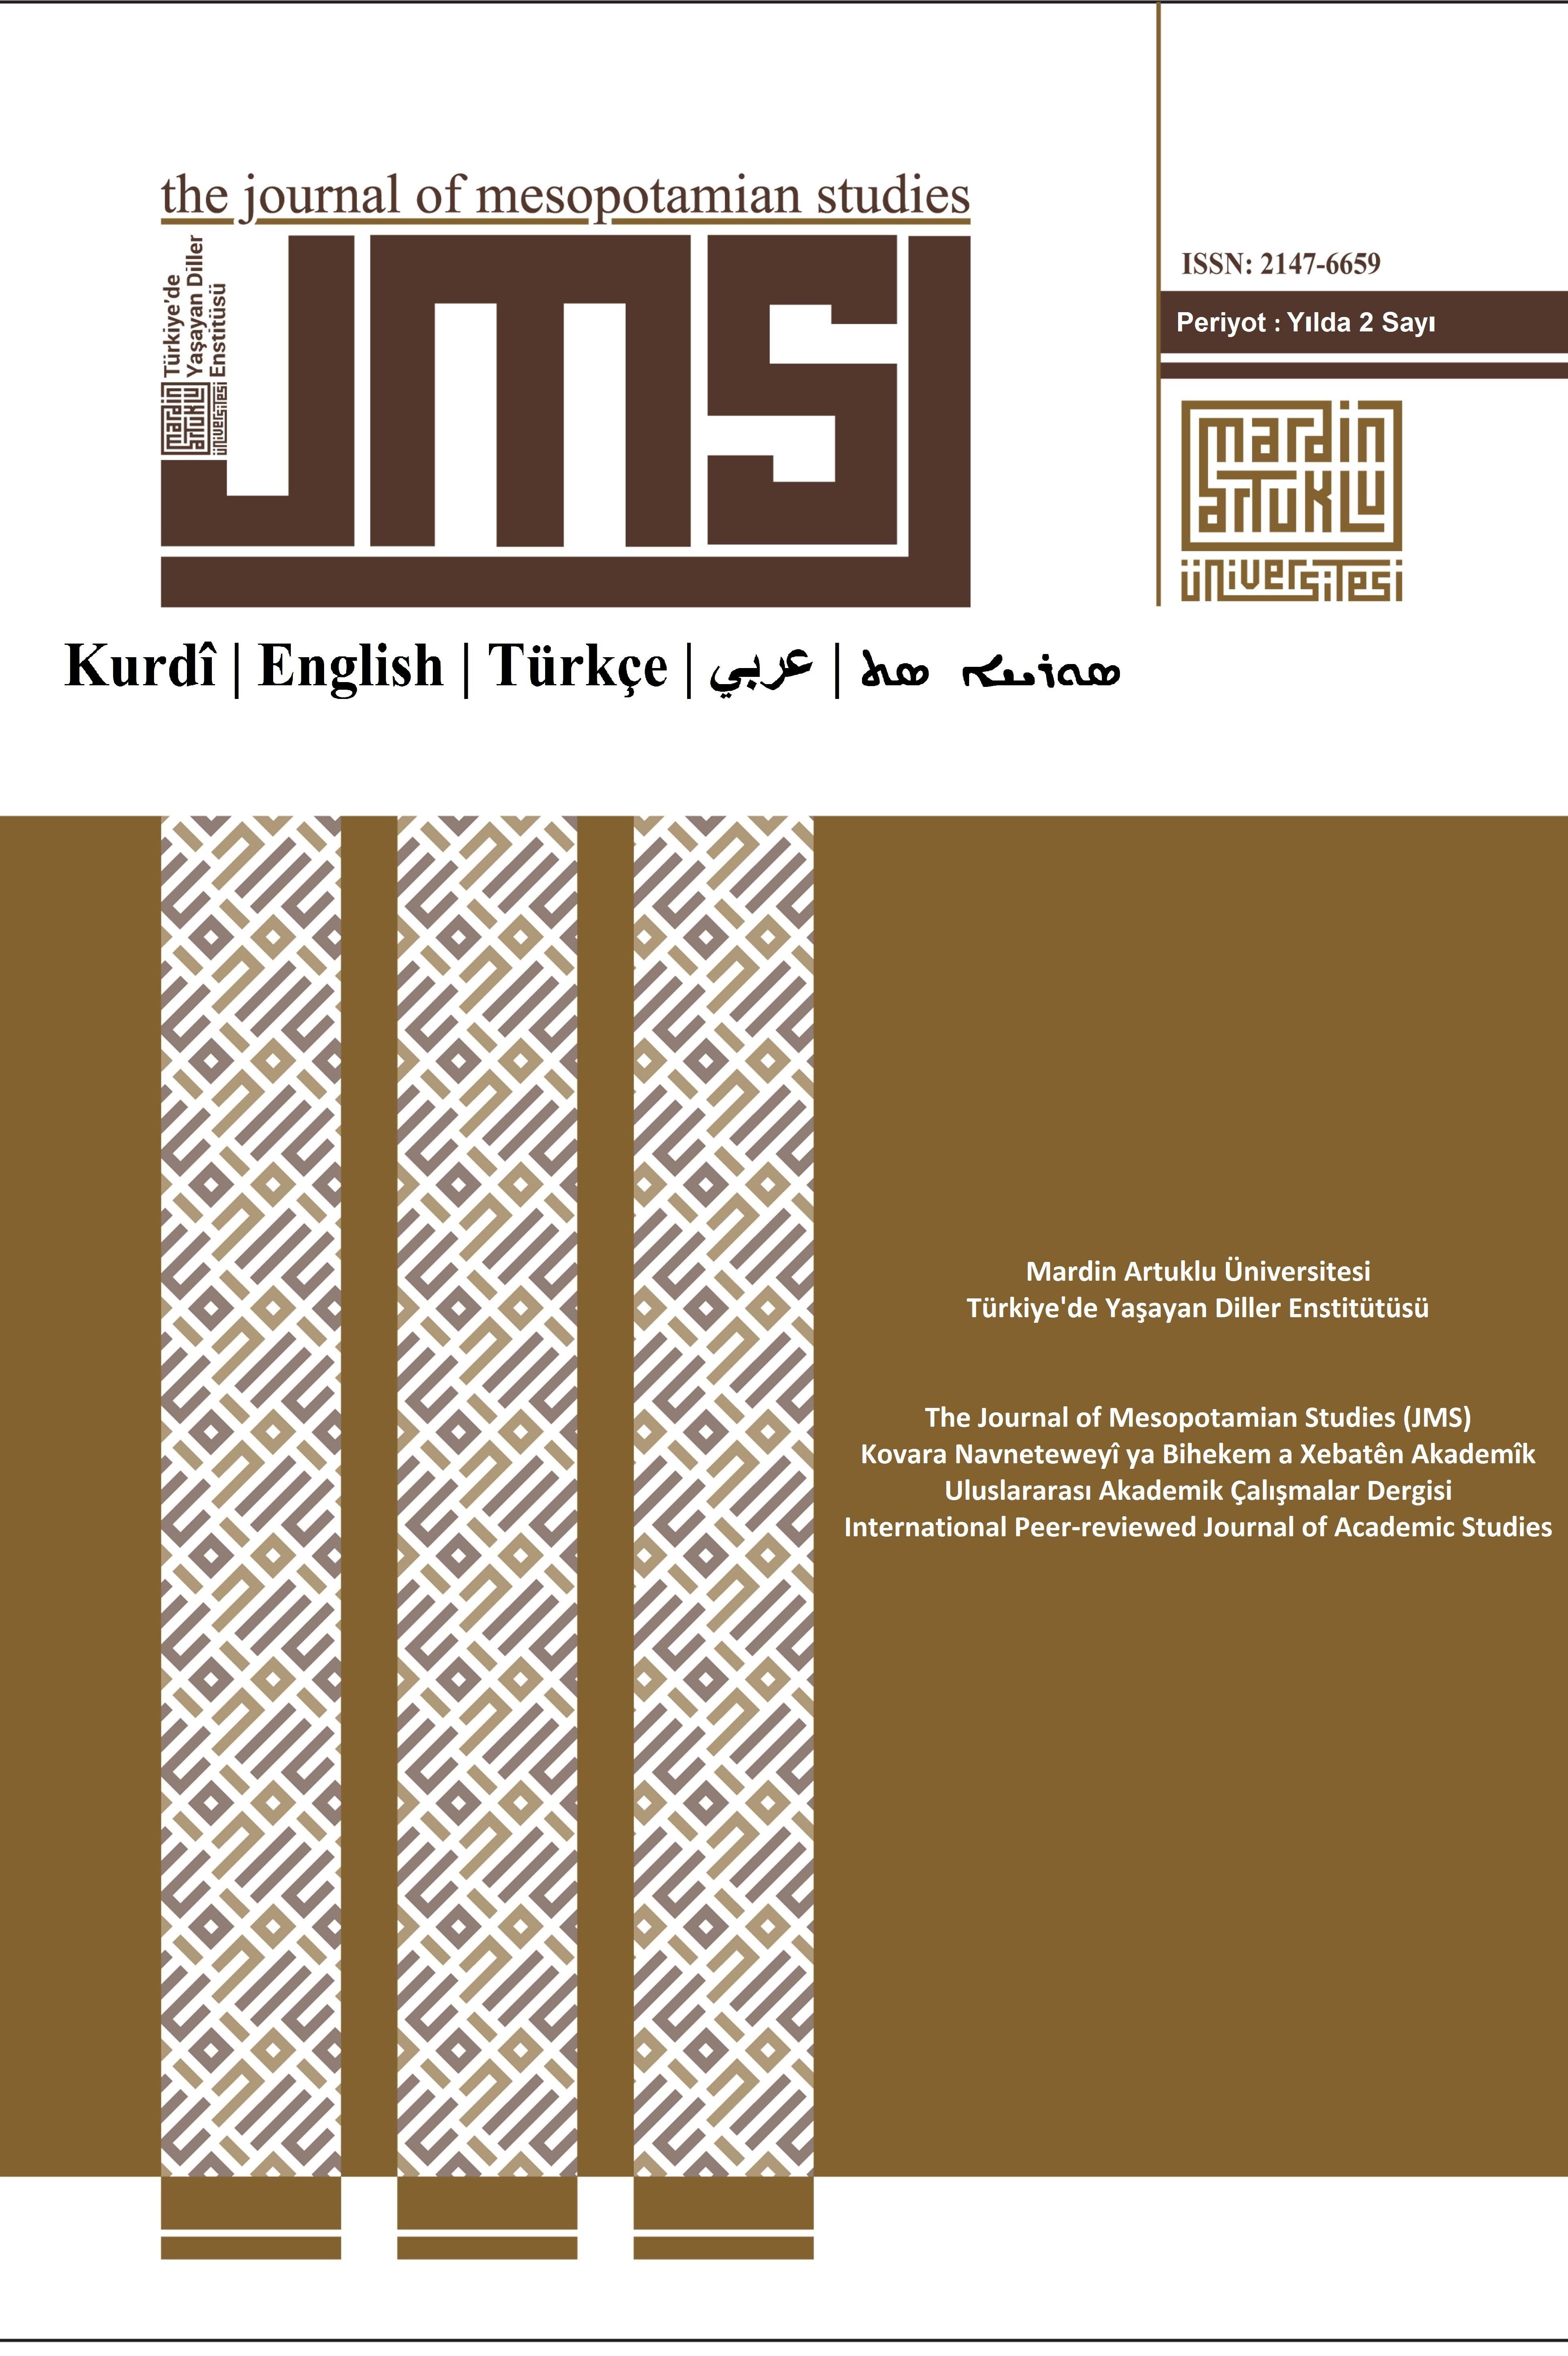 The Journal of Mesopotamian Studies